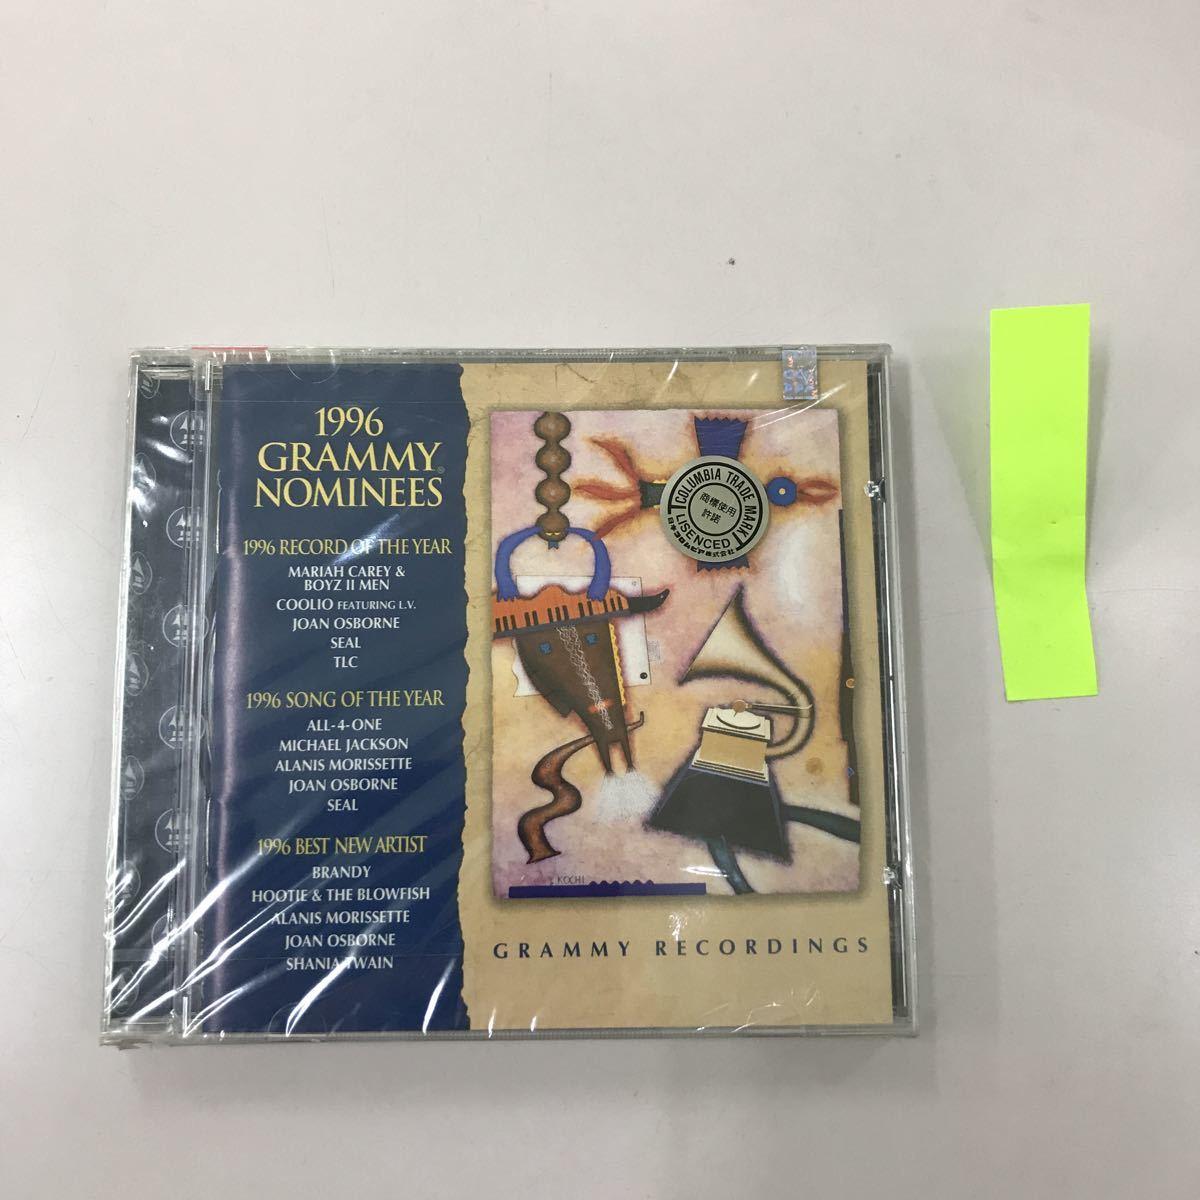 CD 輸入盤未開封【洋楽】長期保存品 '96 GRAMMY NOMINEES